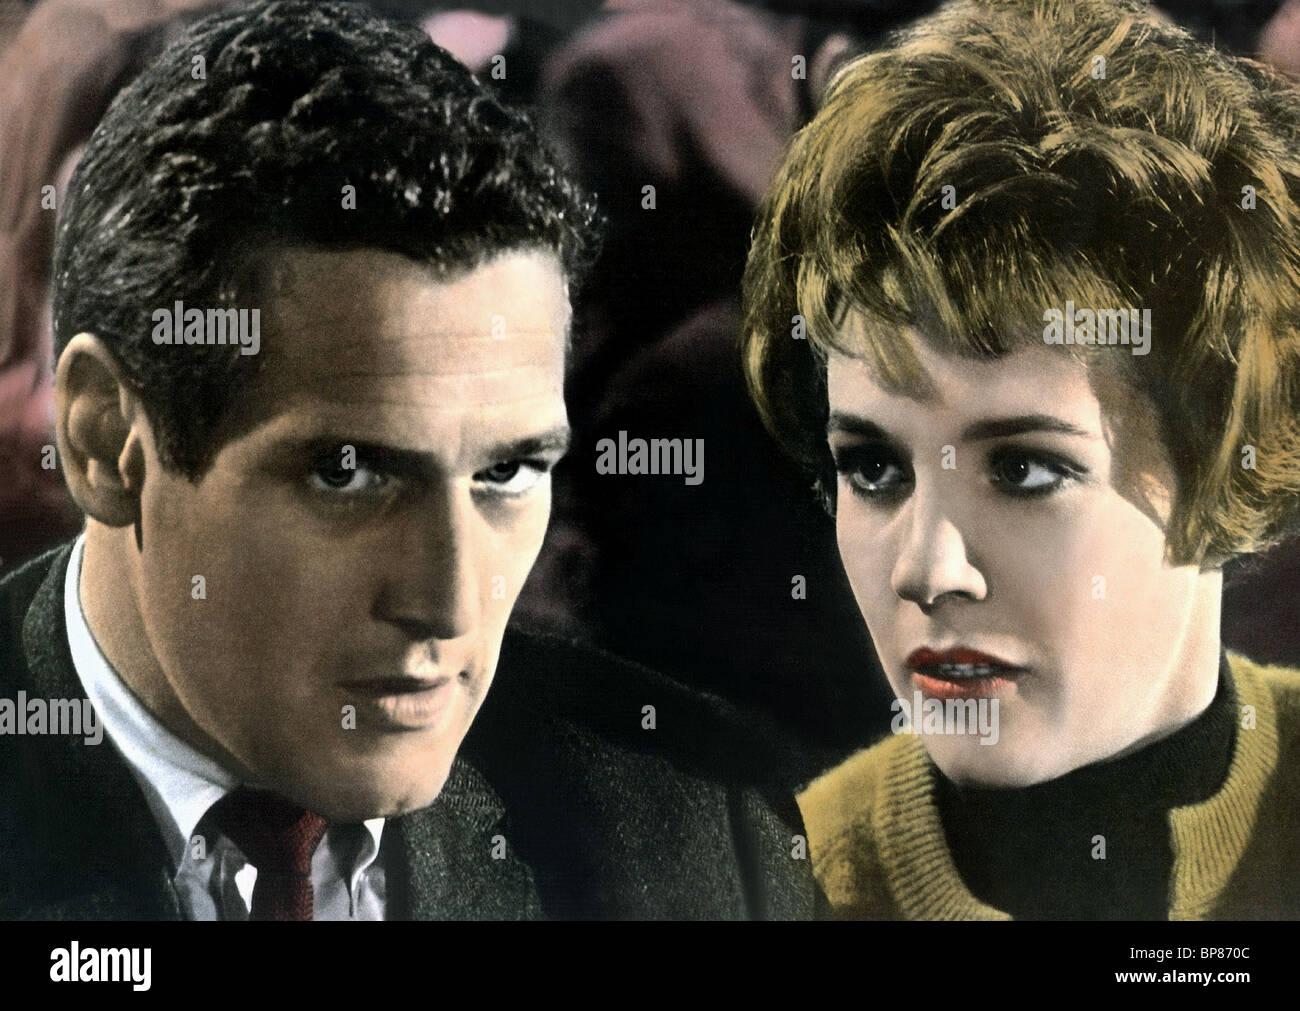 Torn curtain julie andrews - Paul Newman Julie Andrews Torn Curtain 1966